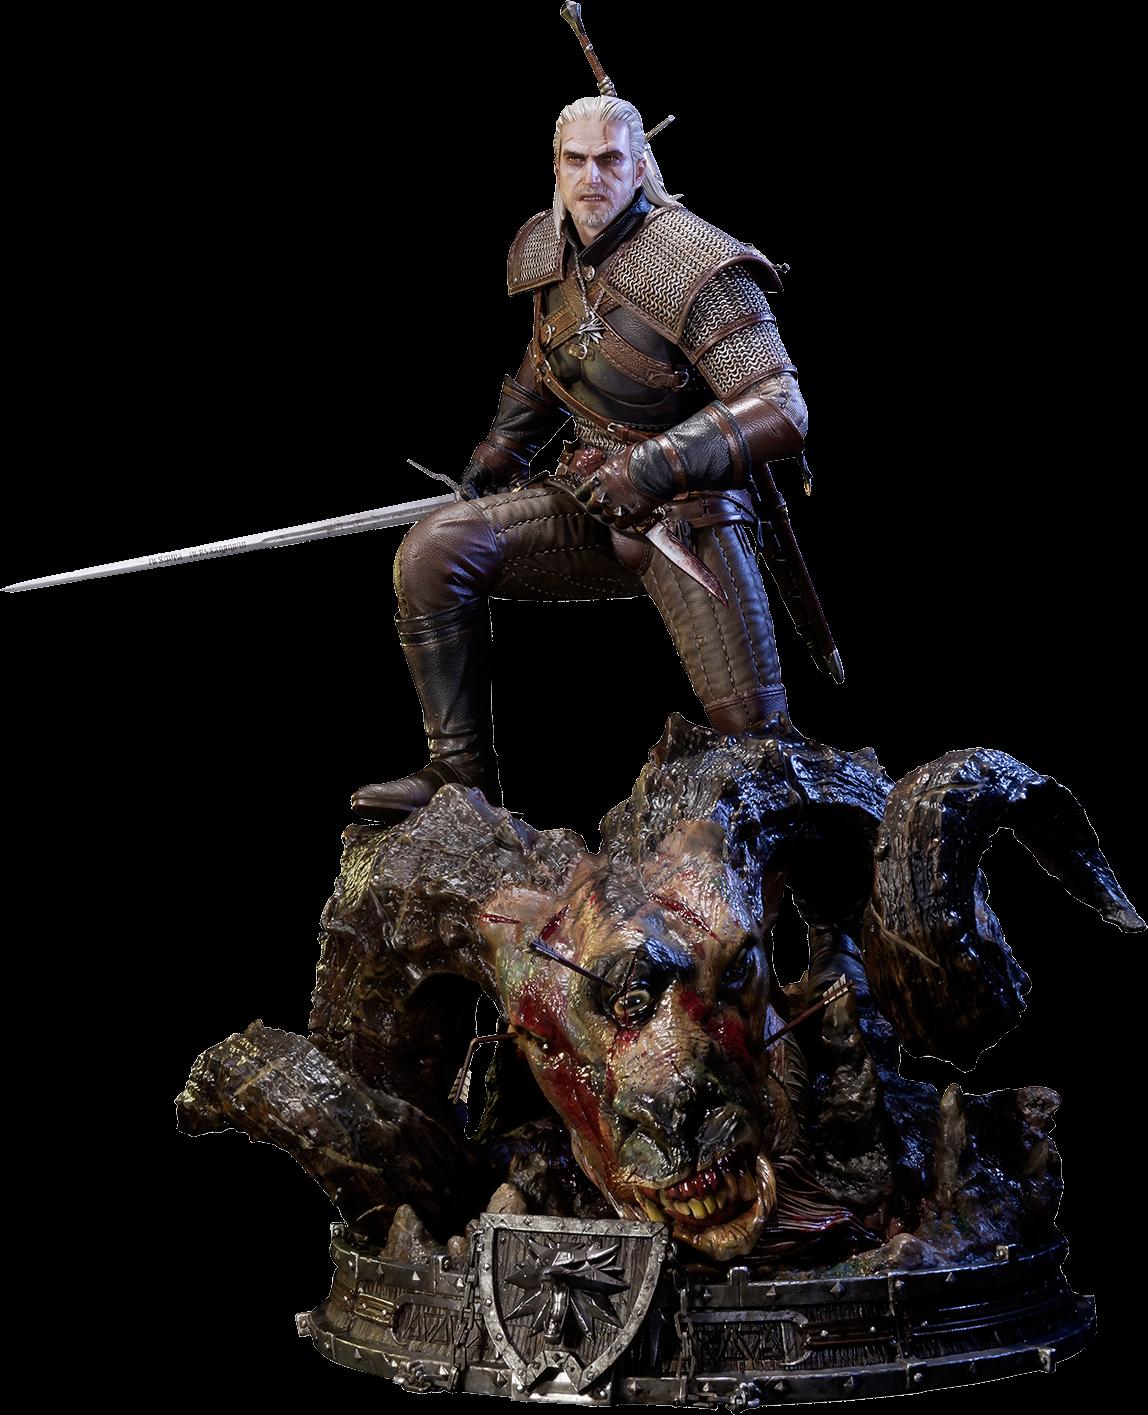 witcher-geralt-rivia-prime-1-statue-01.1498486676.png